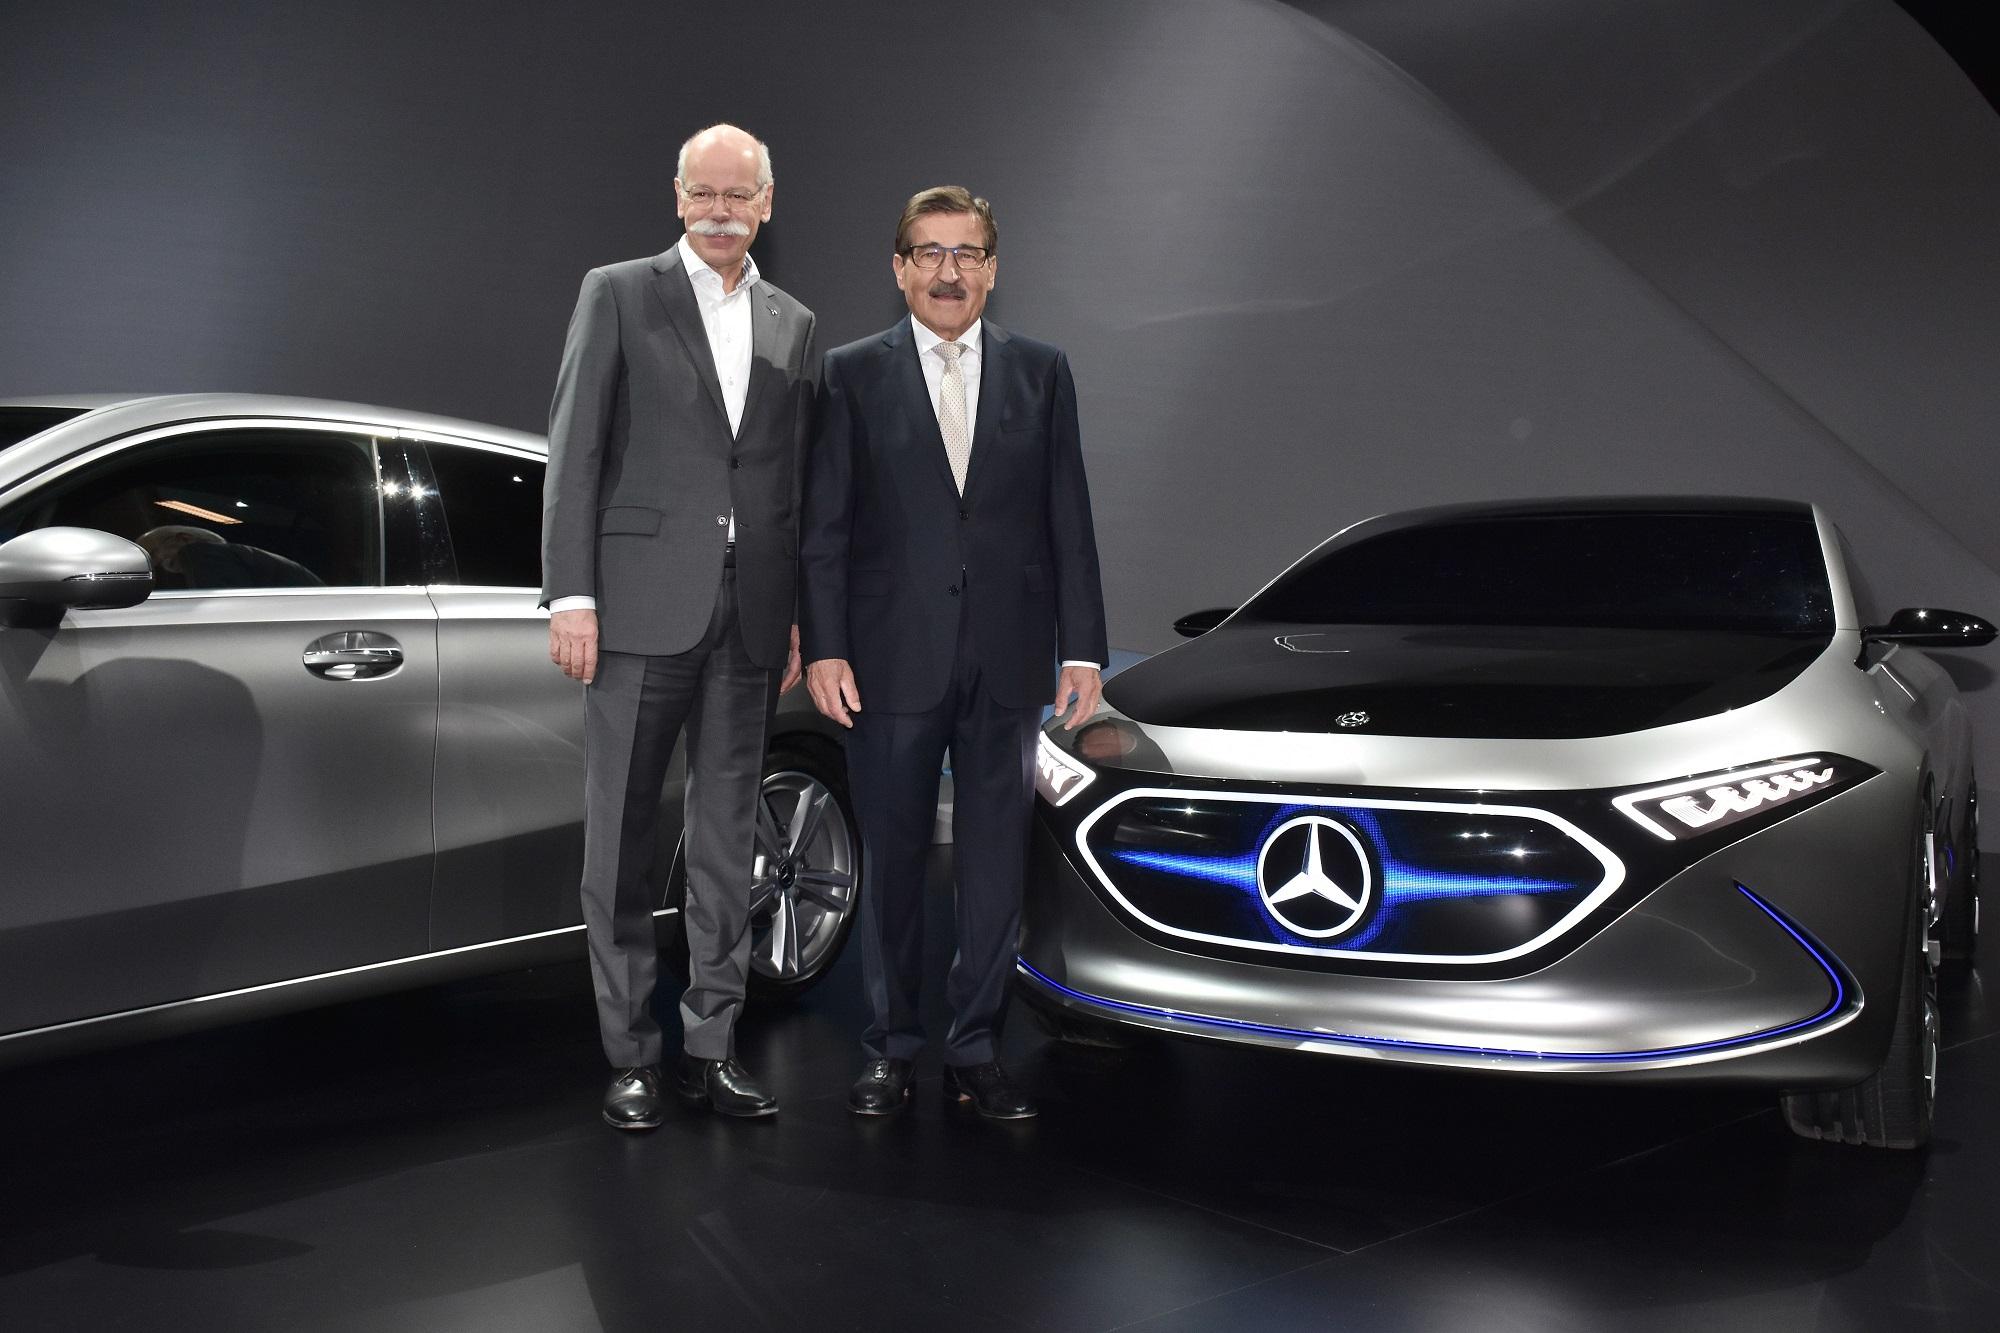 Hauptversammlung der Daimler AG am 5. April 2018 in Berlin. Annual General Meeting of Daimler AG on April 5, 2018 in Berlin.